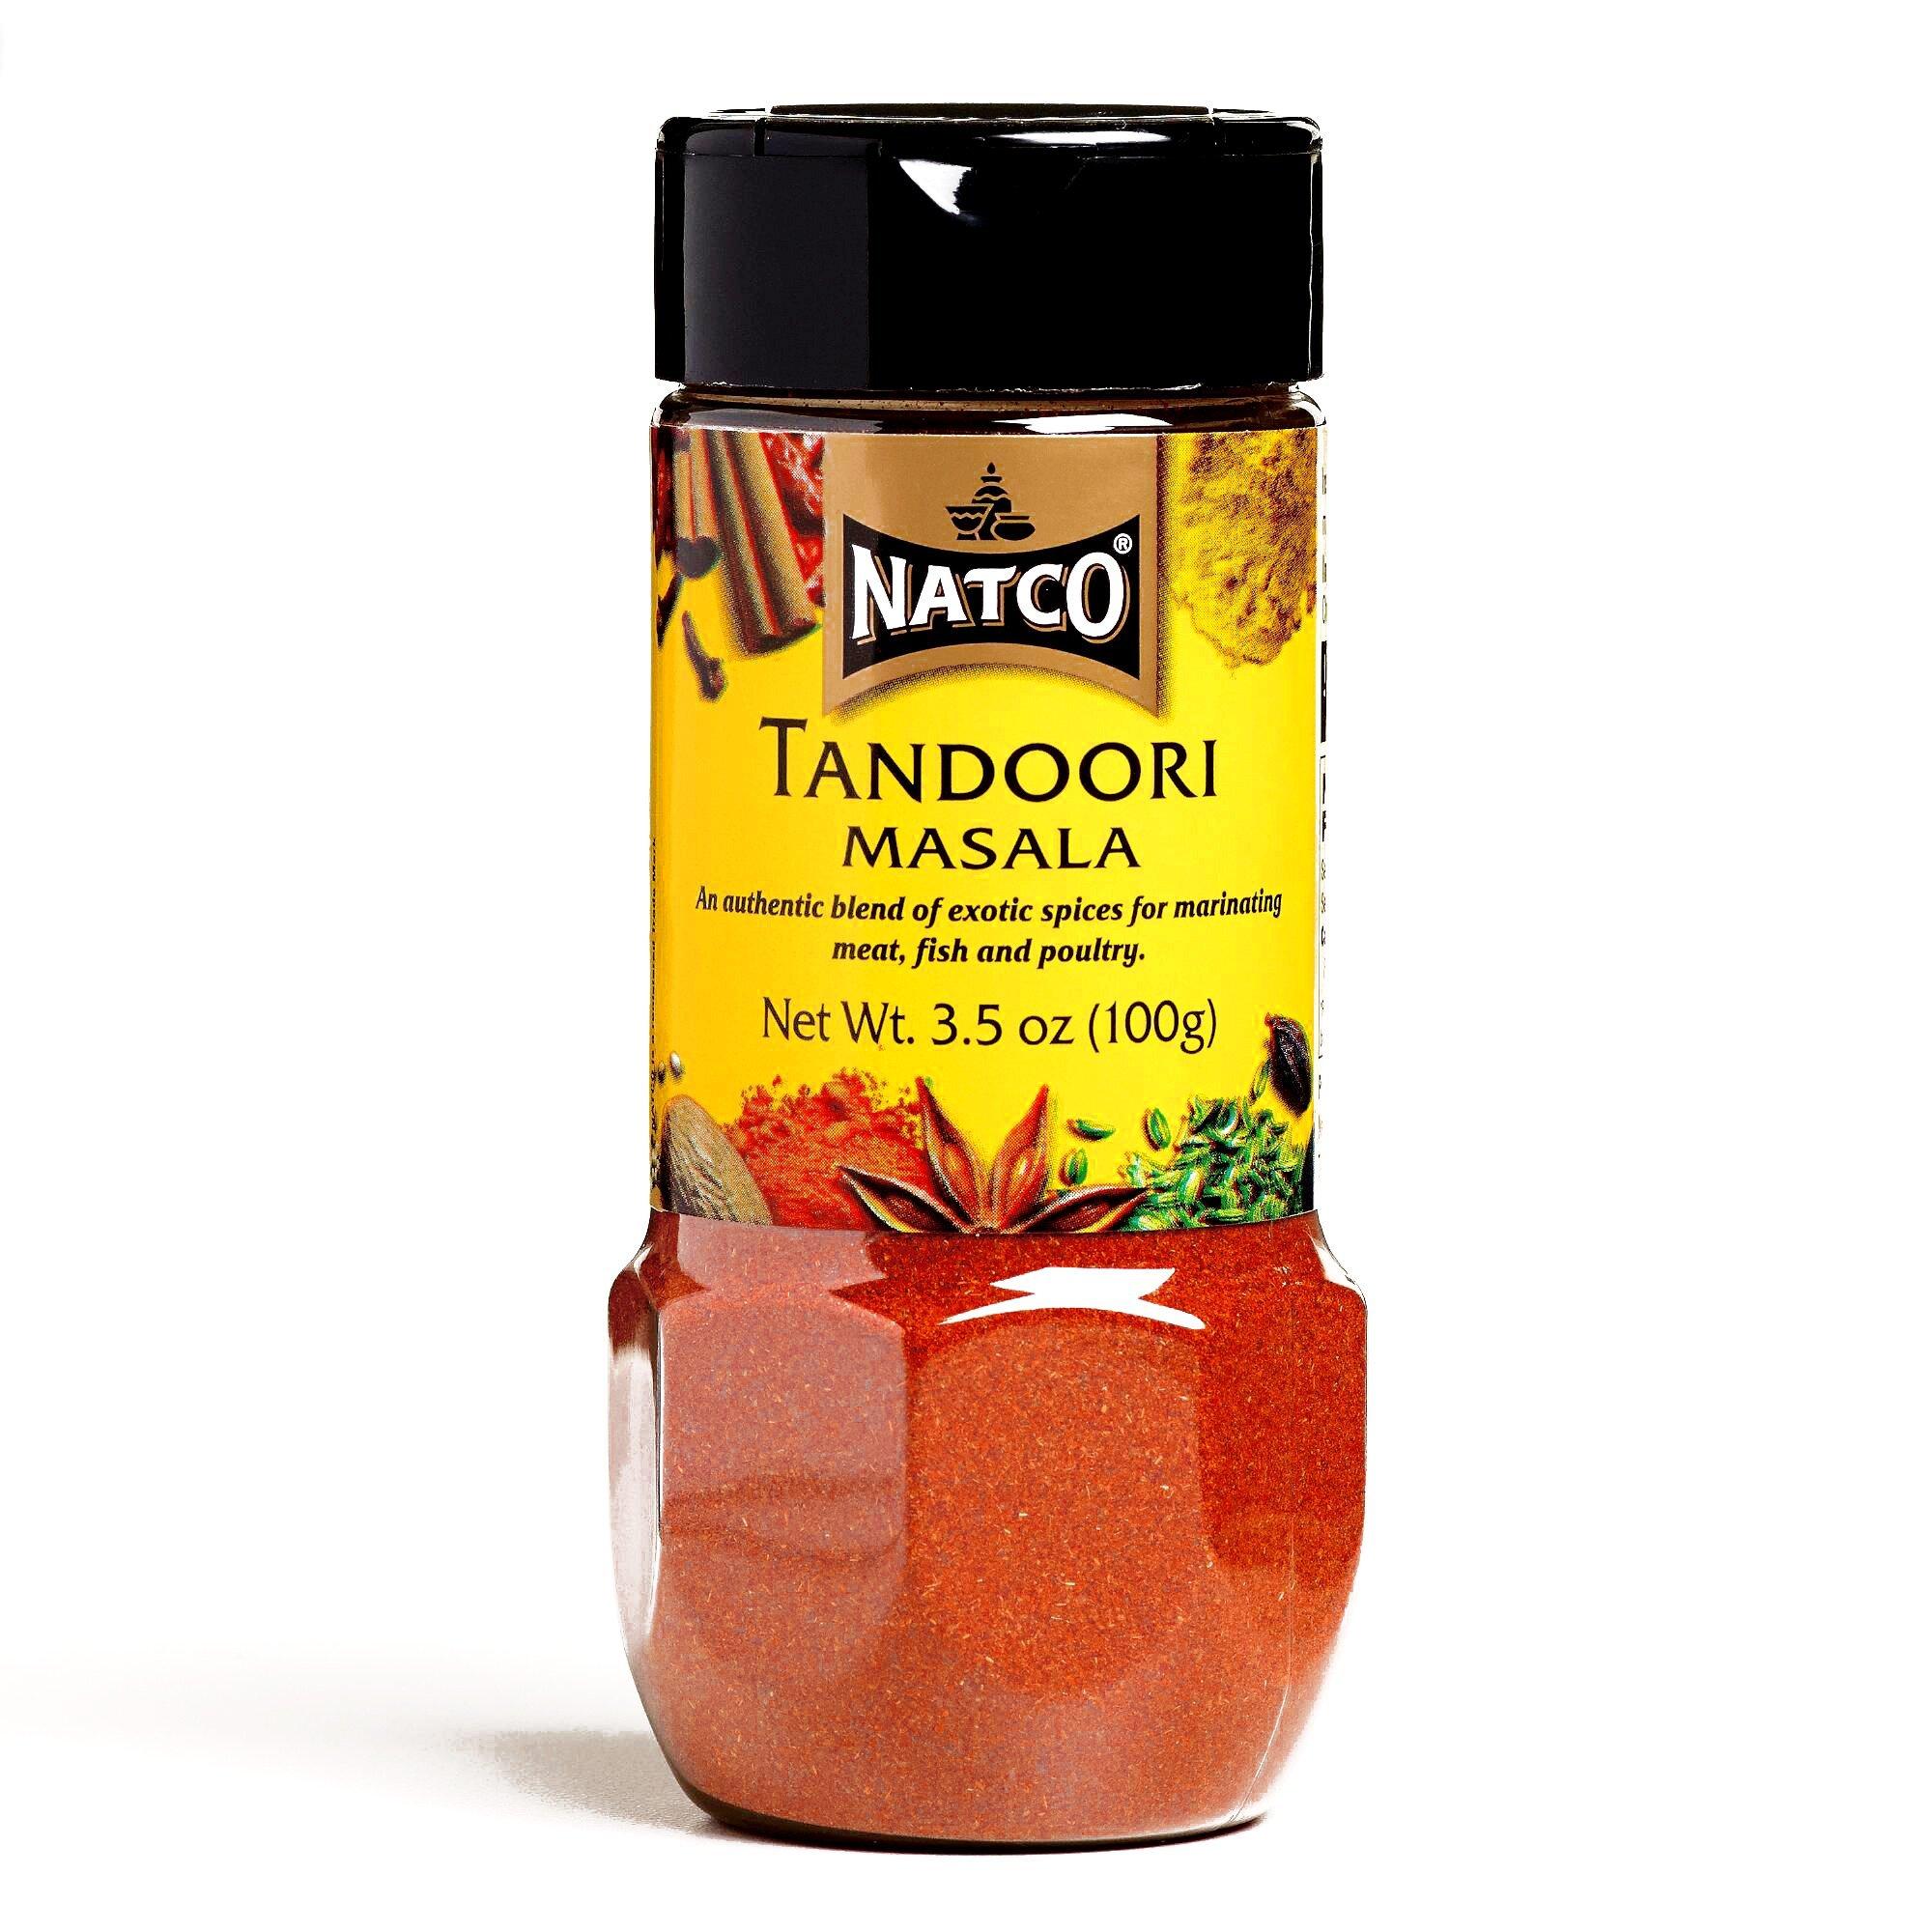 Natco Tandoori Masala (6 Items Per Order)